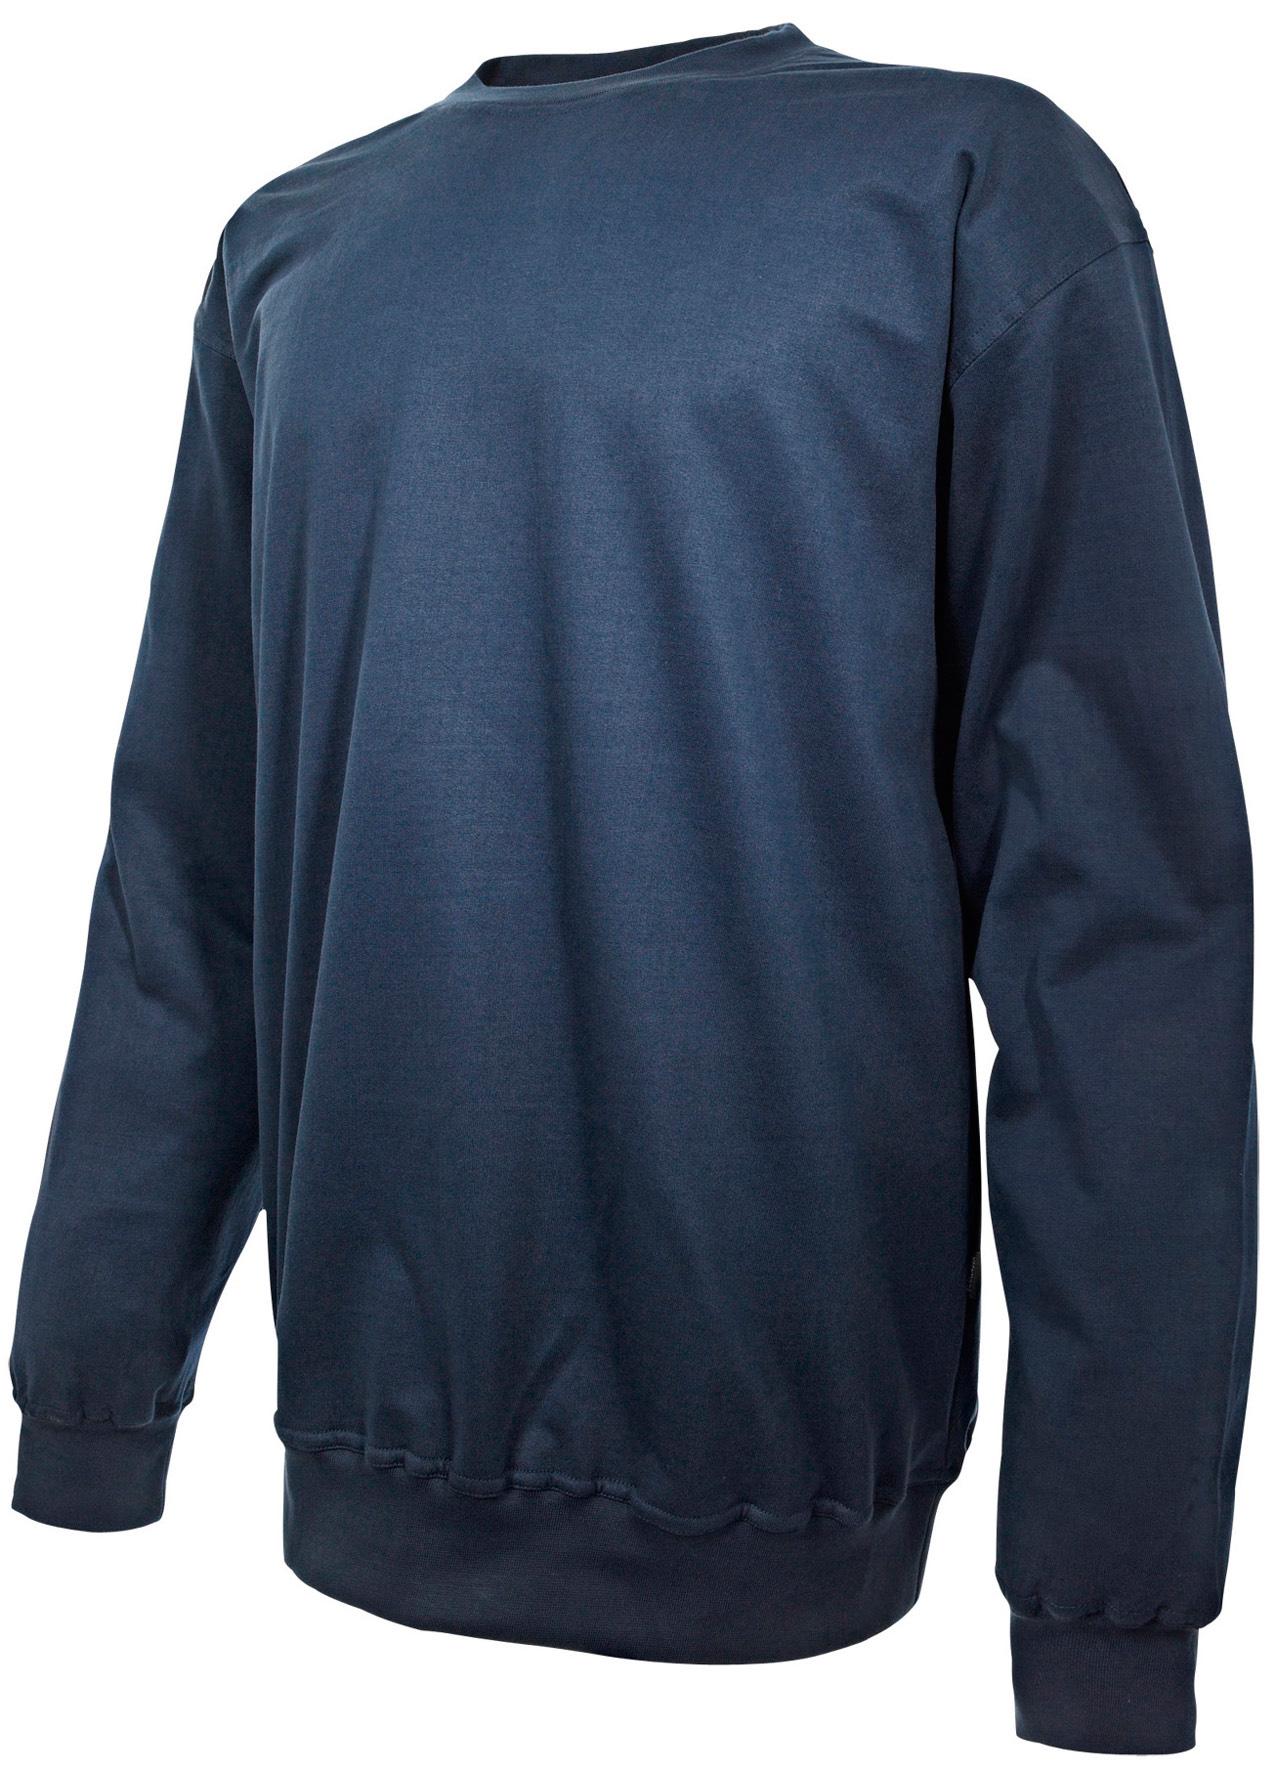 sweatshirt coton sweat et pull v tements de travail hiver v tements de travail v tements. Black Bedroom Furniture Sets. Home Design Ideas